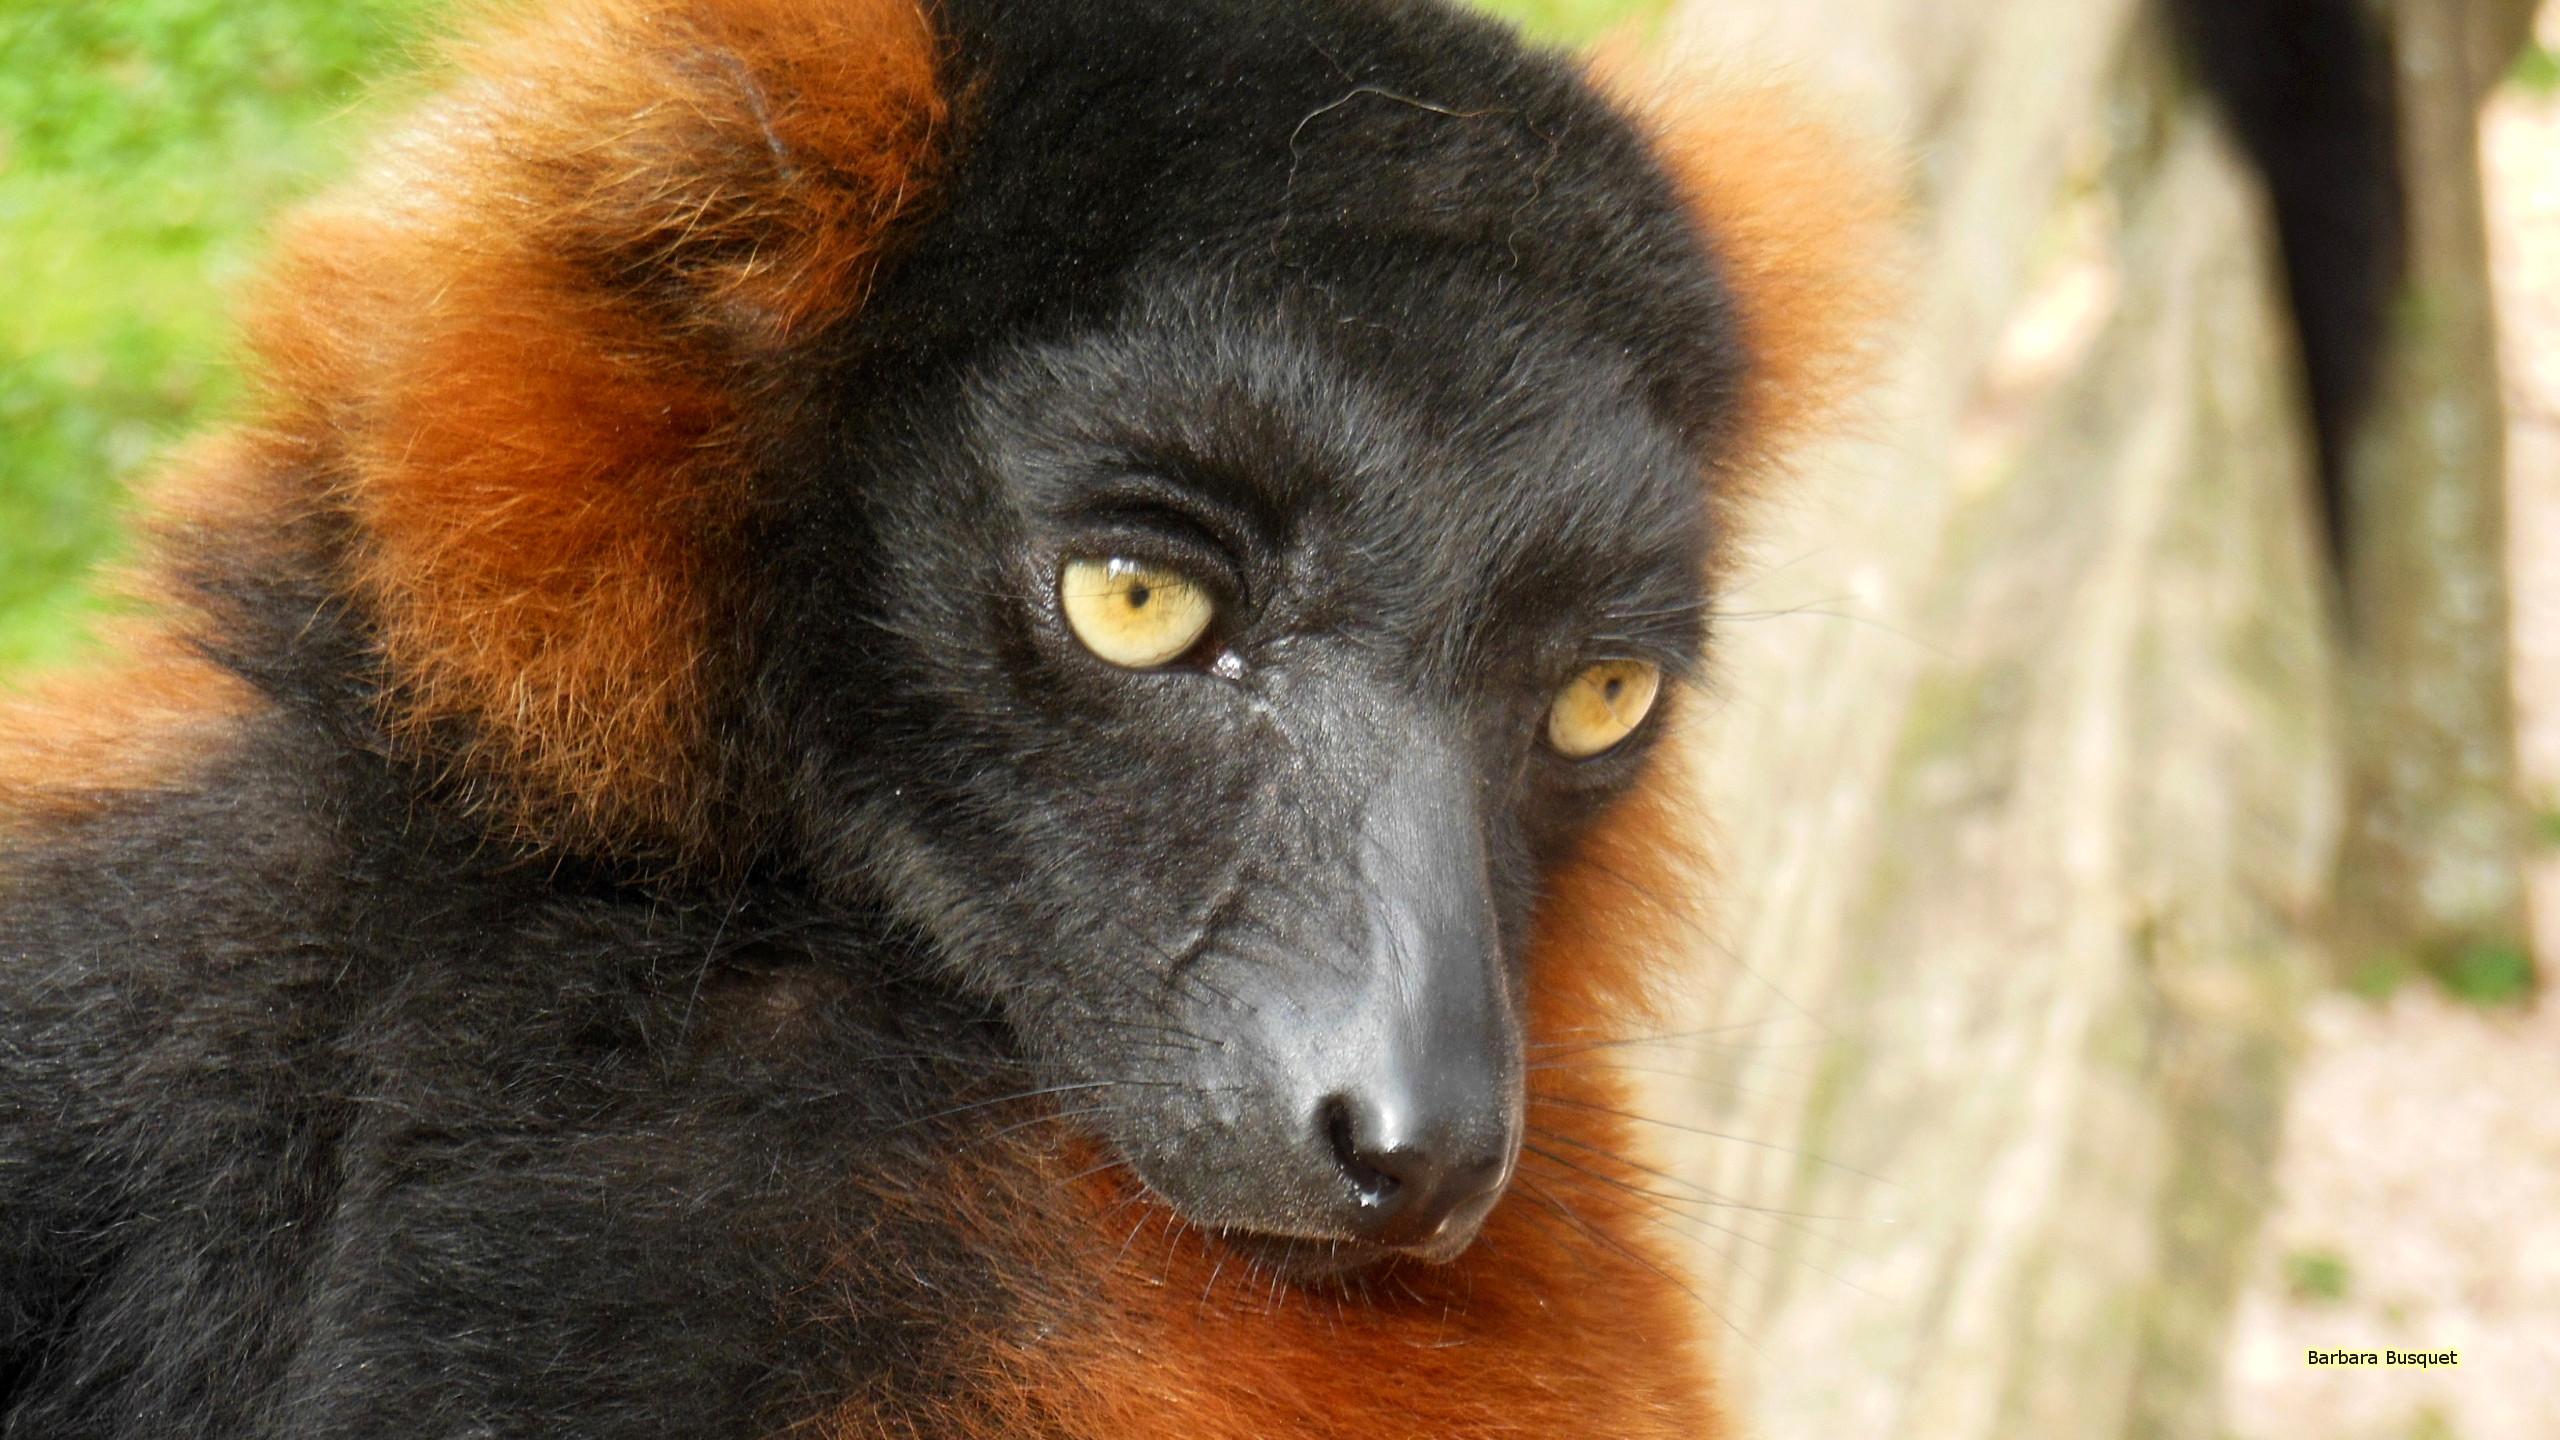 Res: 2560x1440, Lemur Wallpapers 19 - 2560 X 1440